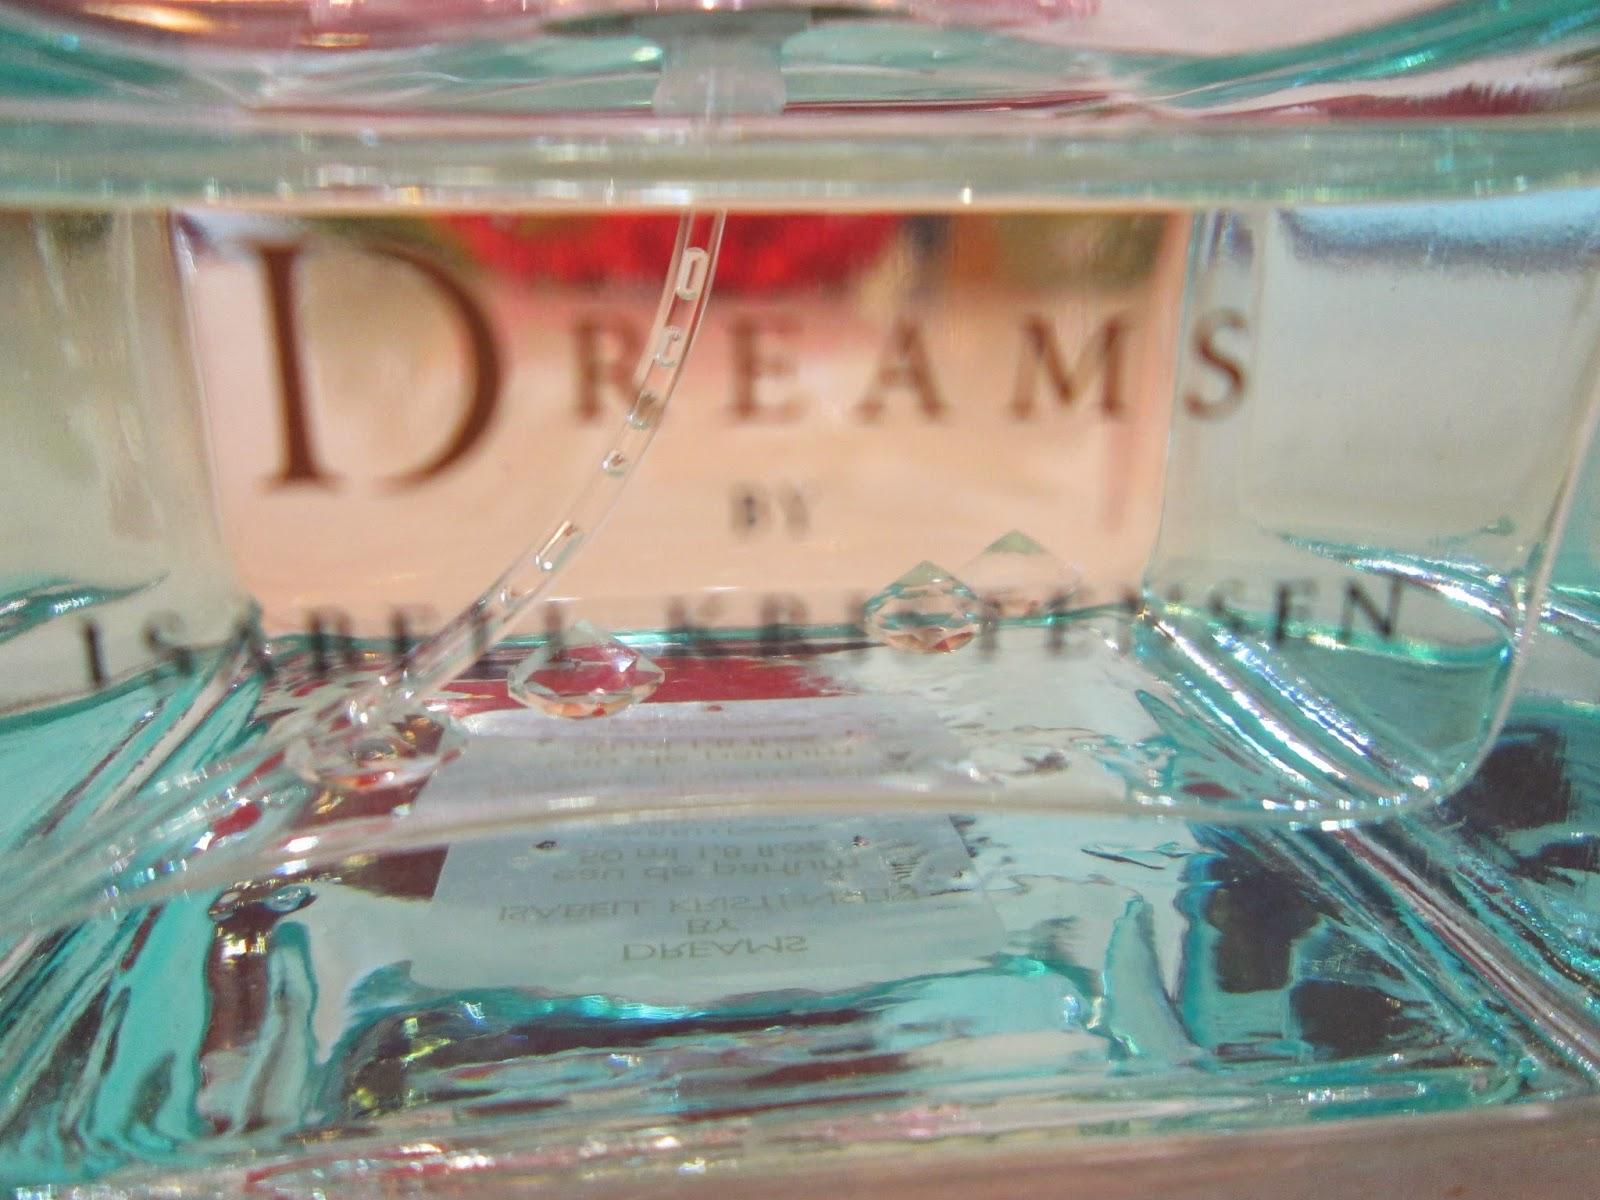 Обзор аромата Dreams от датского бренда Isabell Kristensen (Изабель Кристенсен)